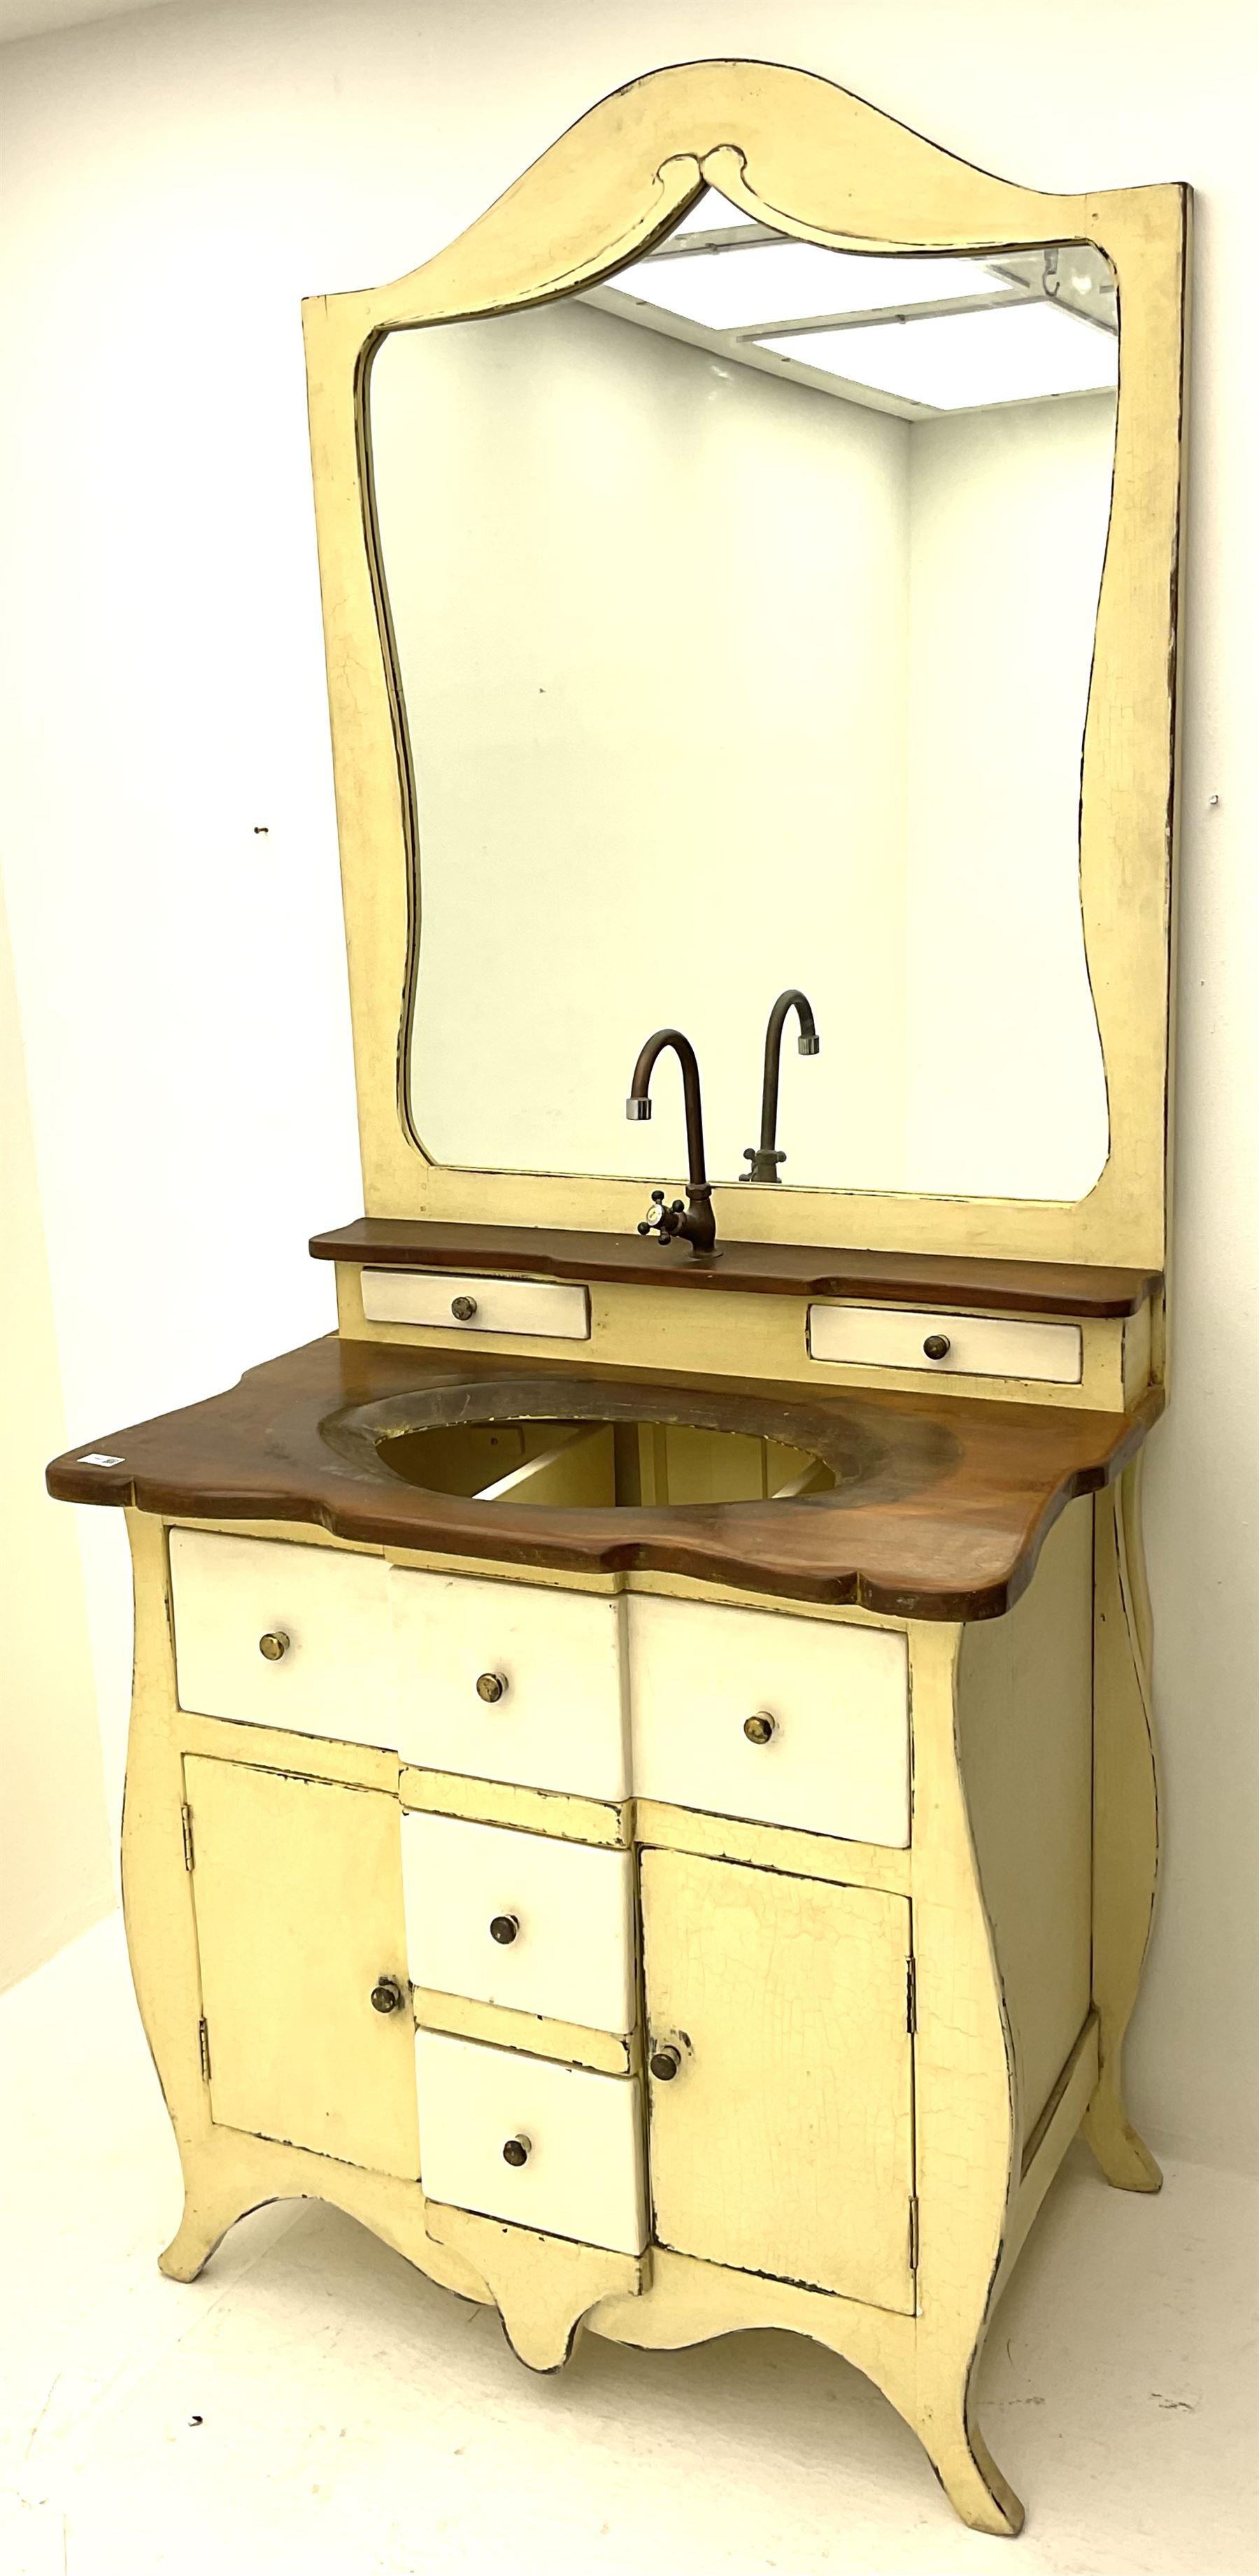 Distressed cream painted vanity unit